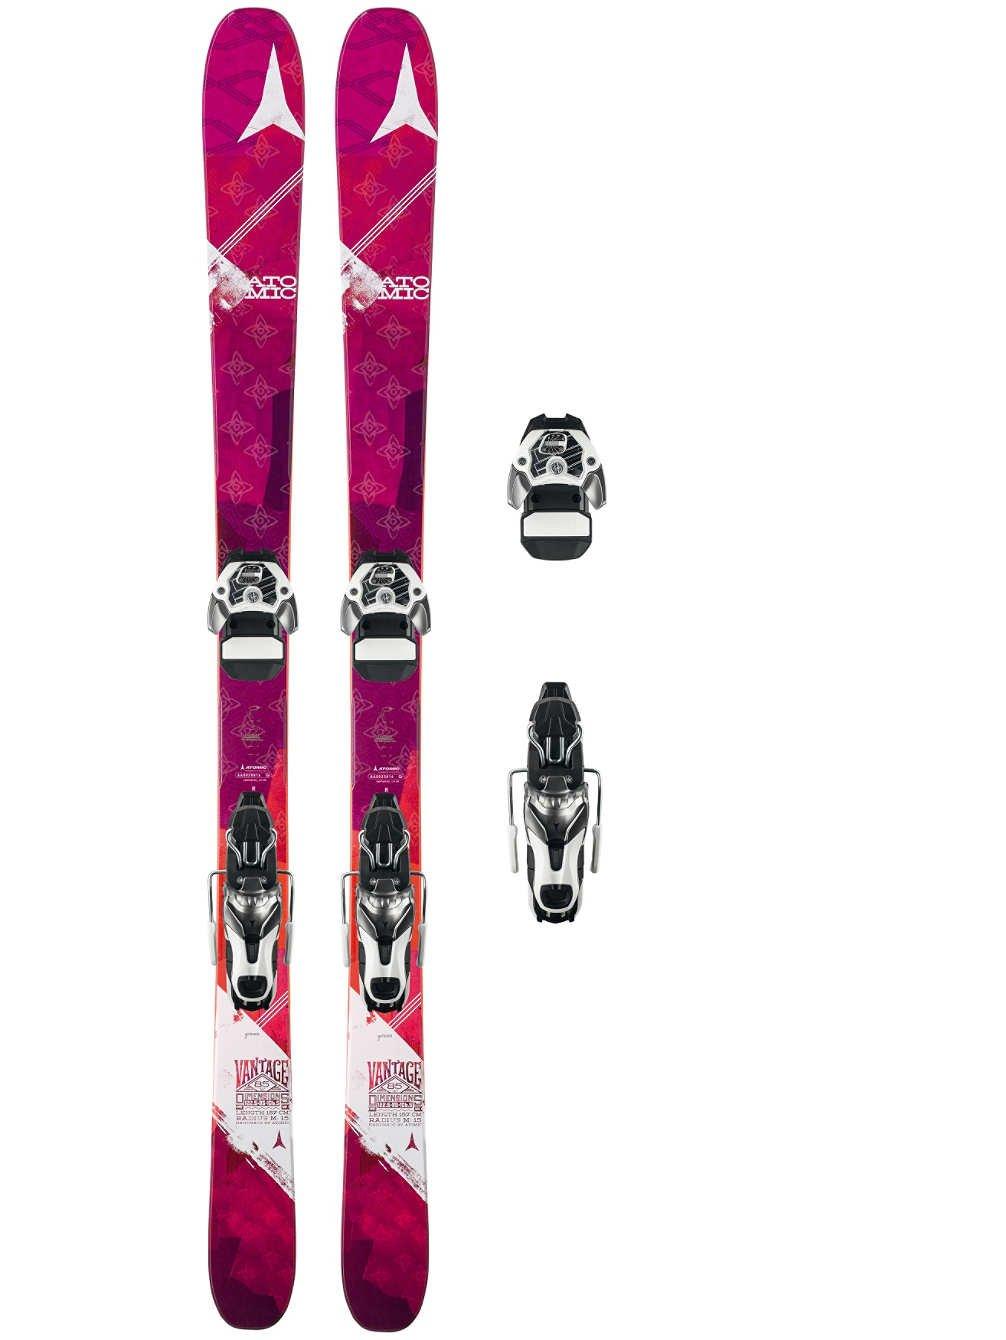 Ski Set Women Atomic Vantage 85 W 165 + Warden 11 2017  Amazon.co.uk   Sports   Outdoors 0b7d6d211